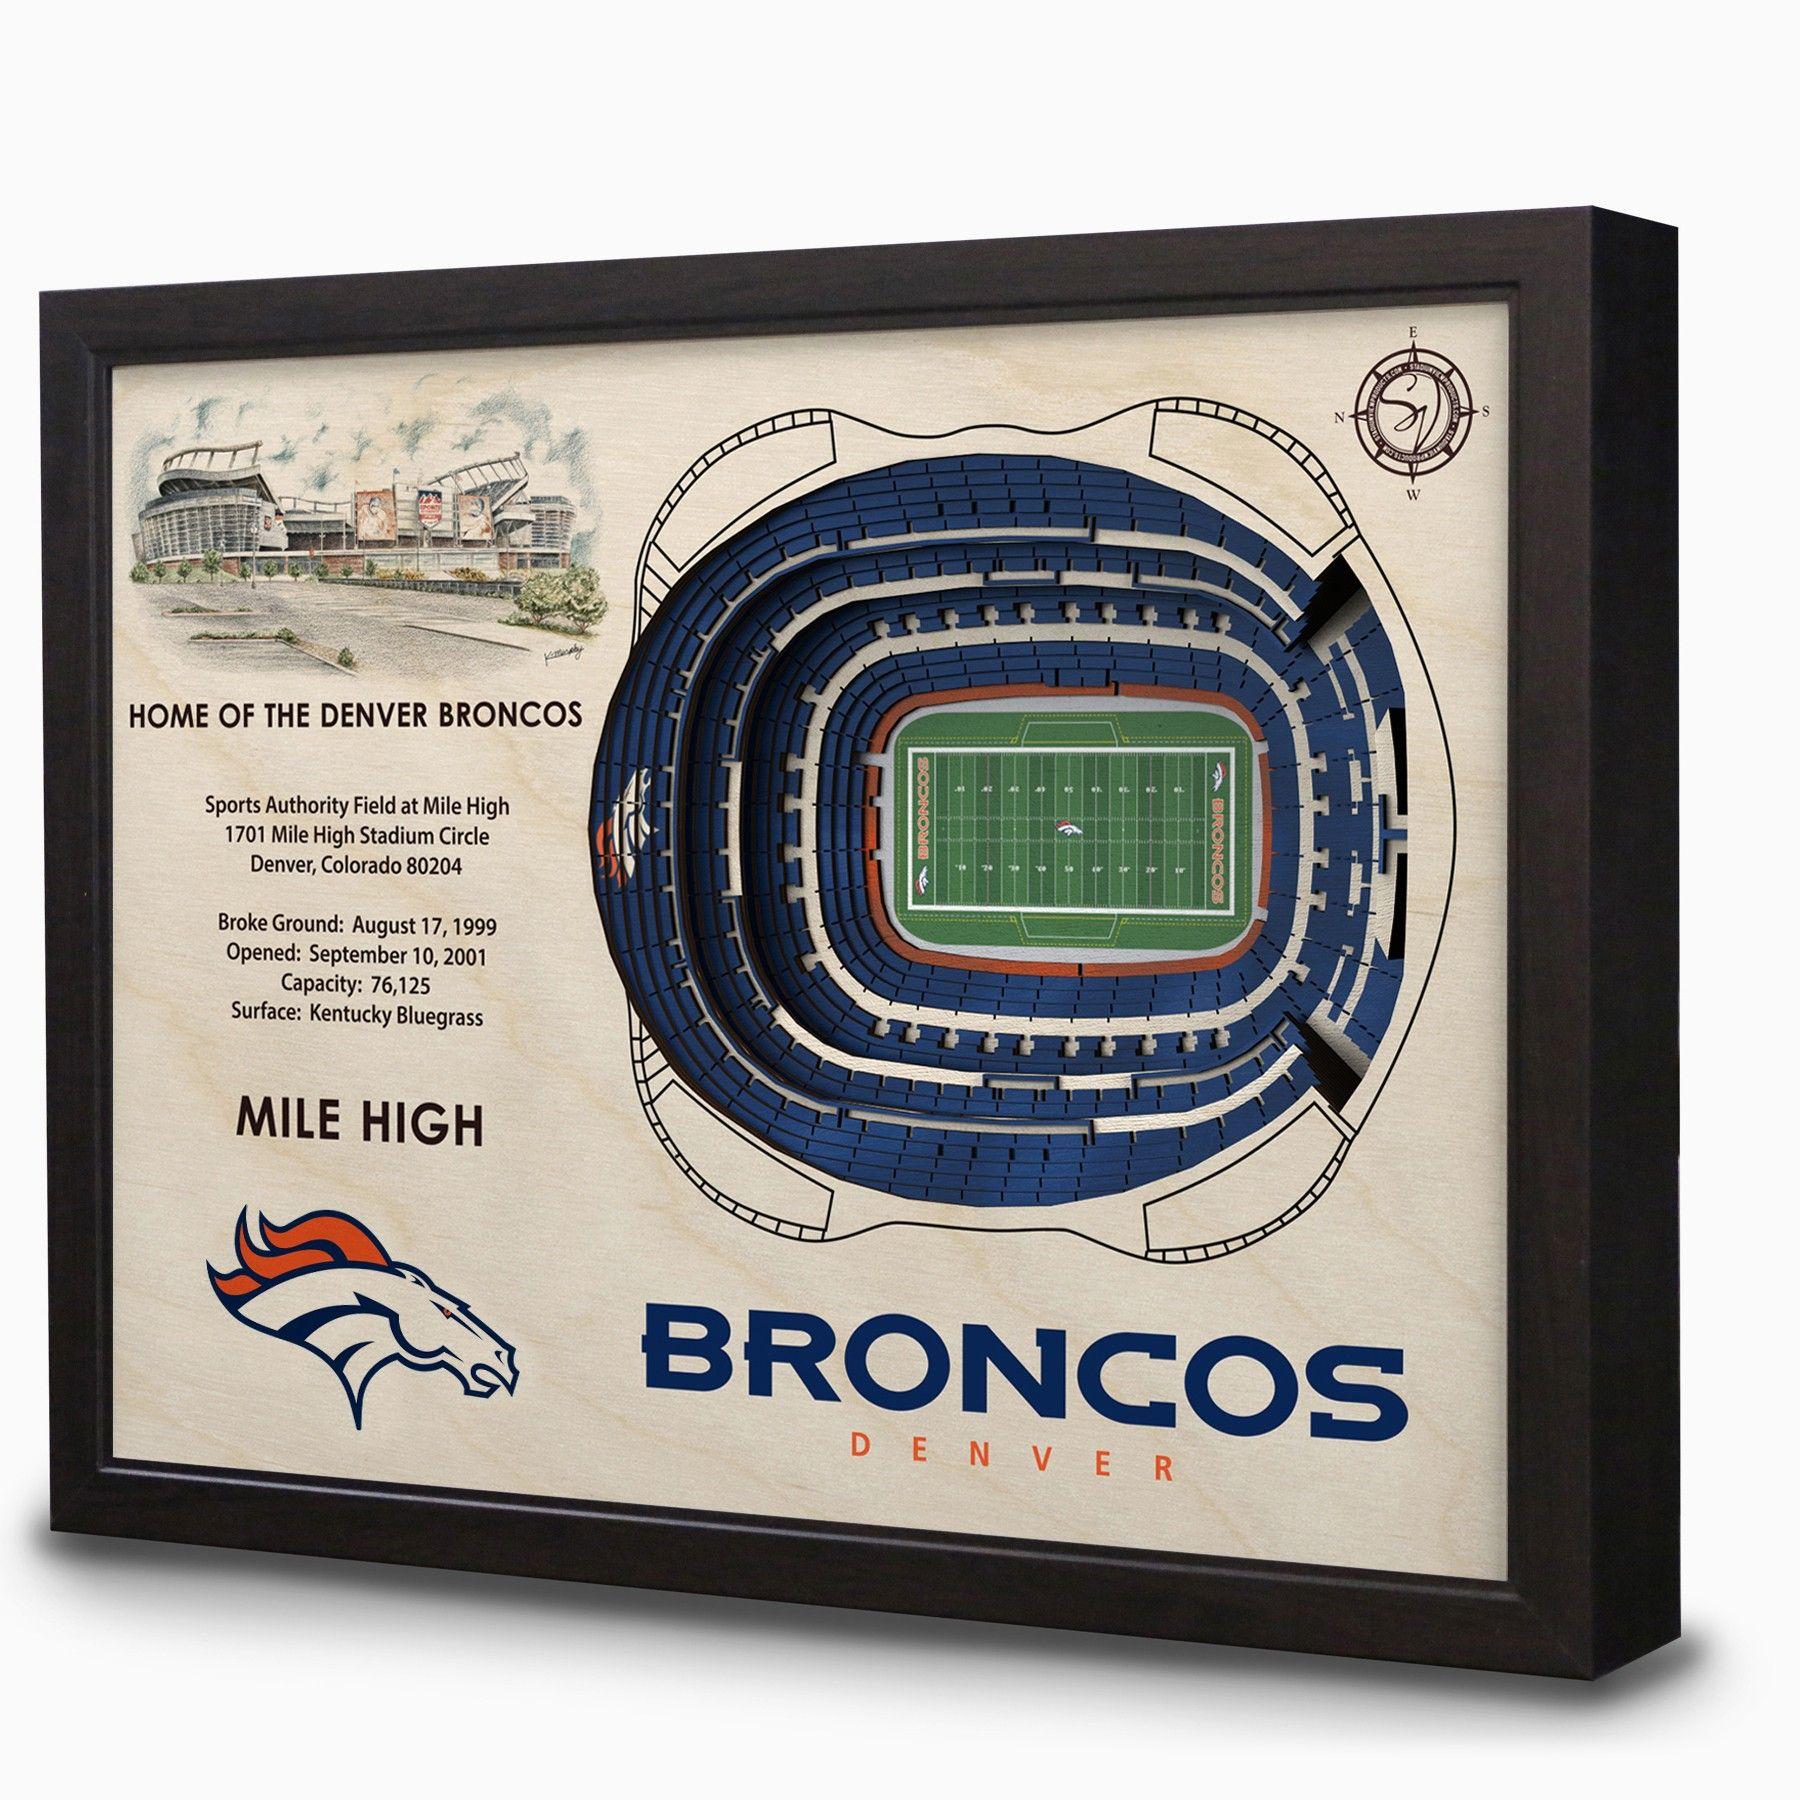 Denver Broncos Wall Decor denver broncos stadiumview wall art - sports authority field at